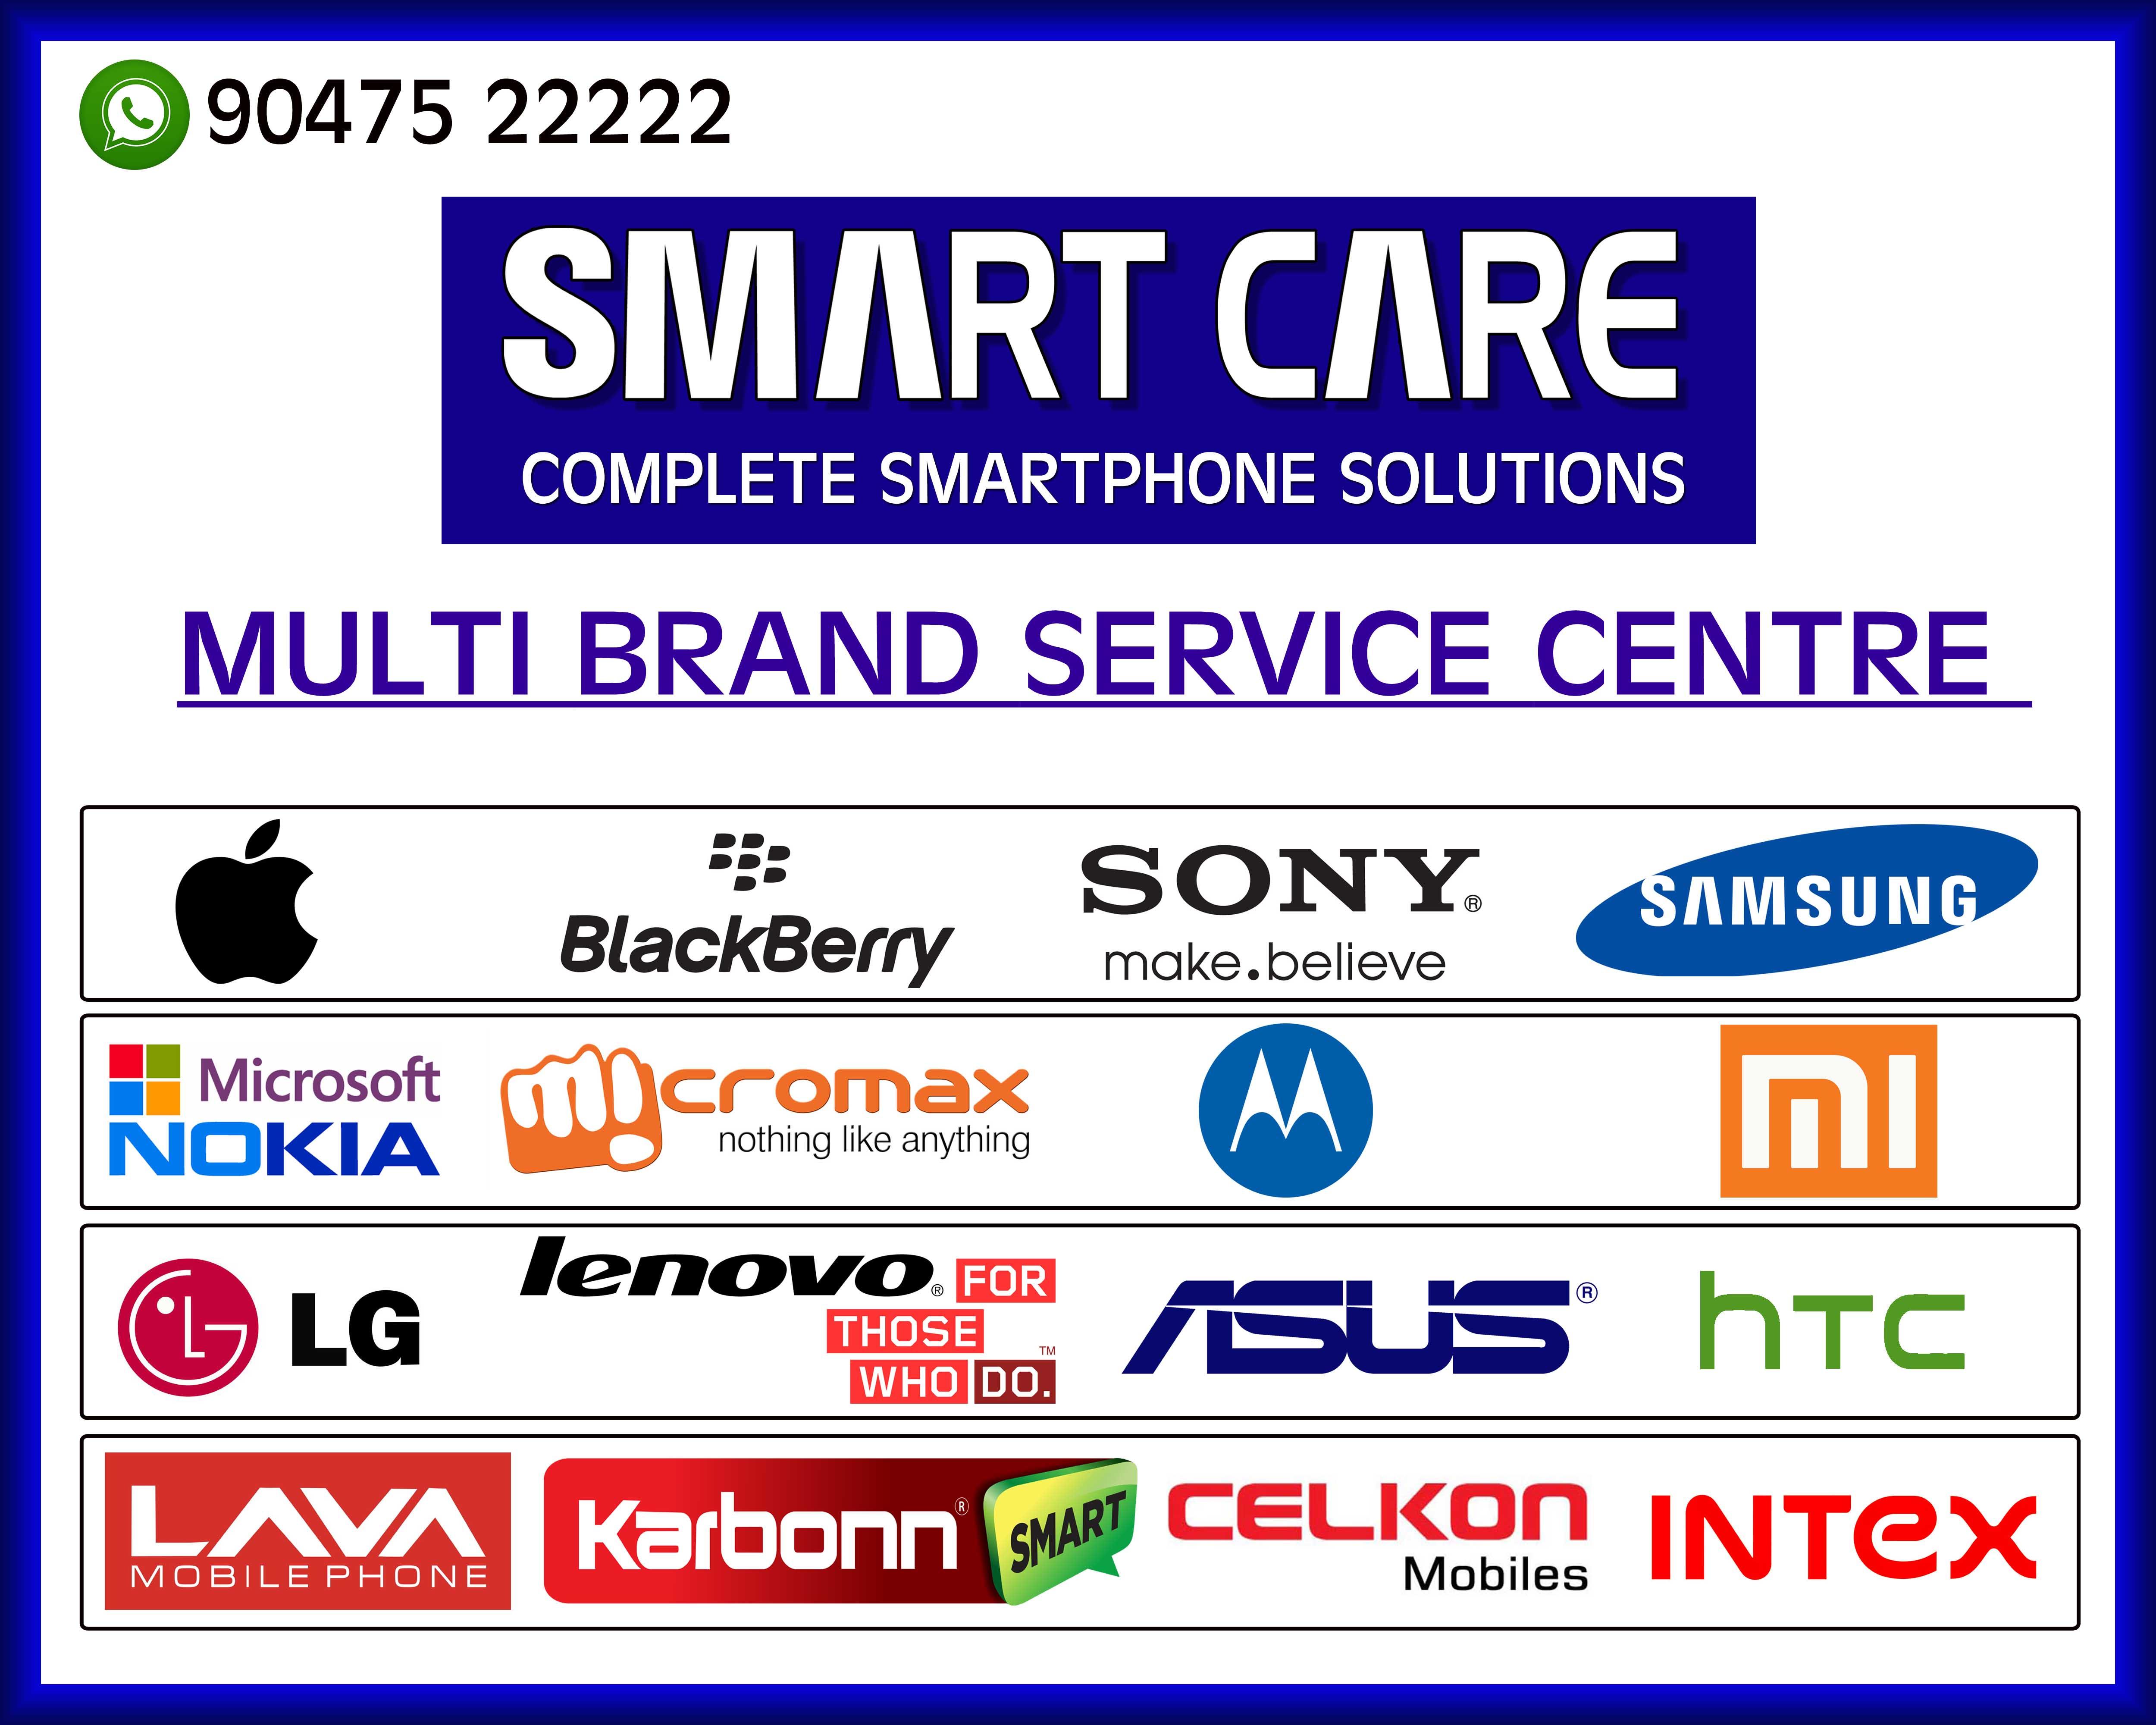 Smart Care iPhone oneplus honor mi oppo Asus in Dindigul